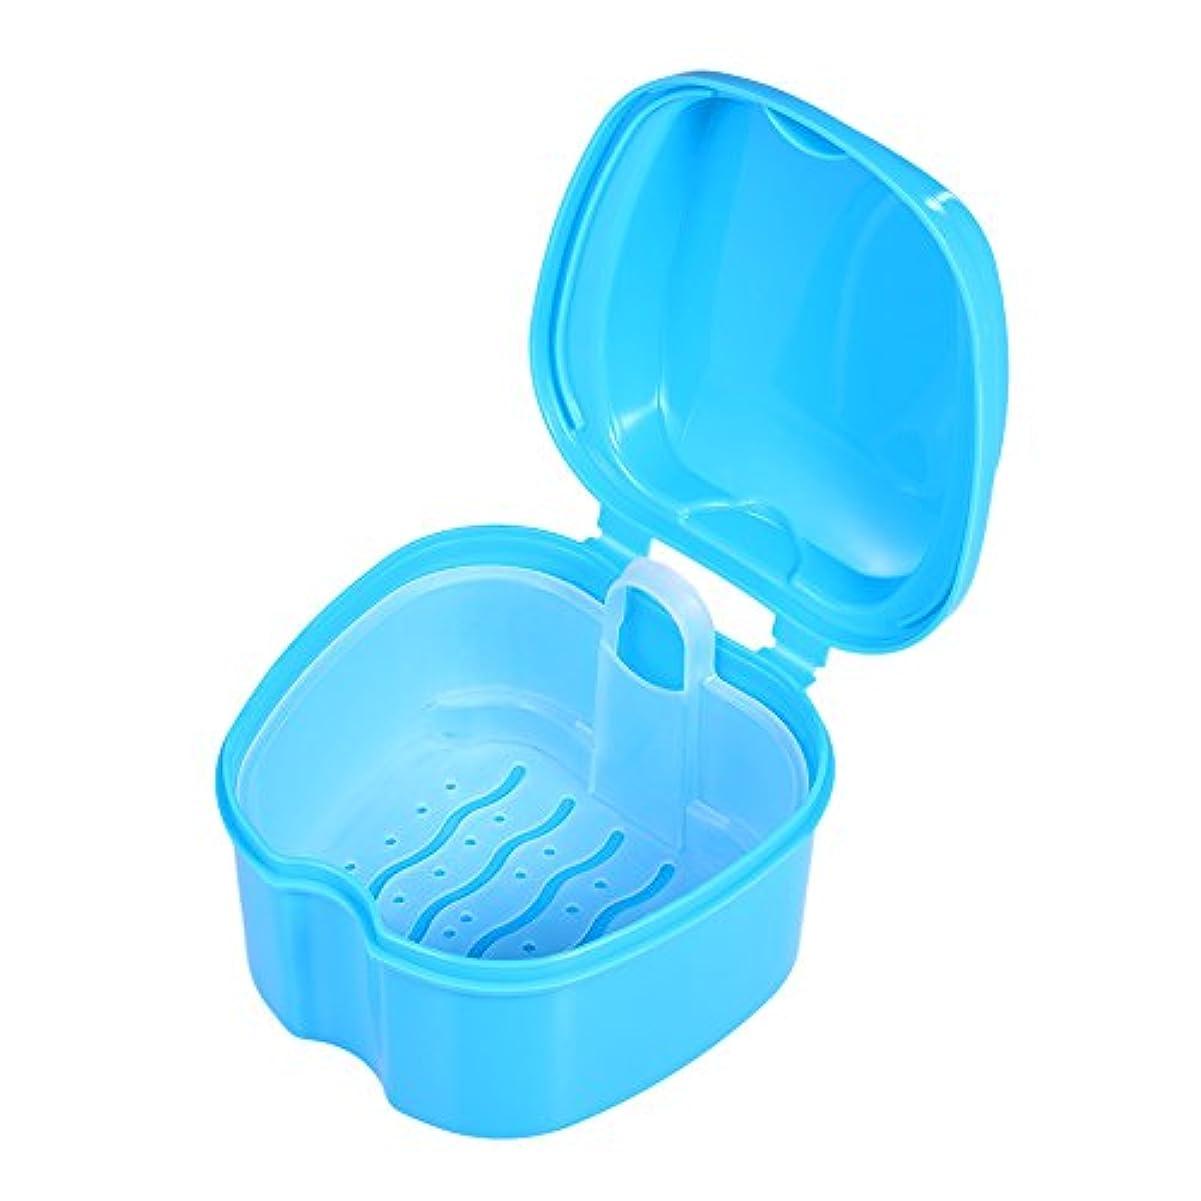 Decdeal 歯のボックスケース 偽の歯のストレージボックス 歯のクリーニングコンテナ リンスバスケット リテーナーアプライアンスホルダートレイ